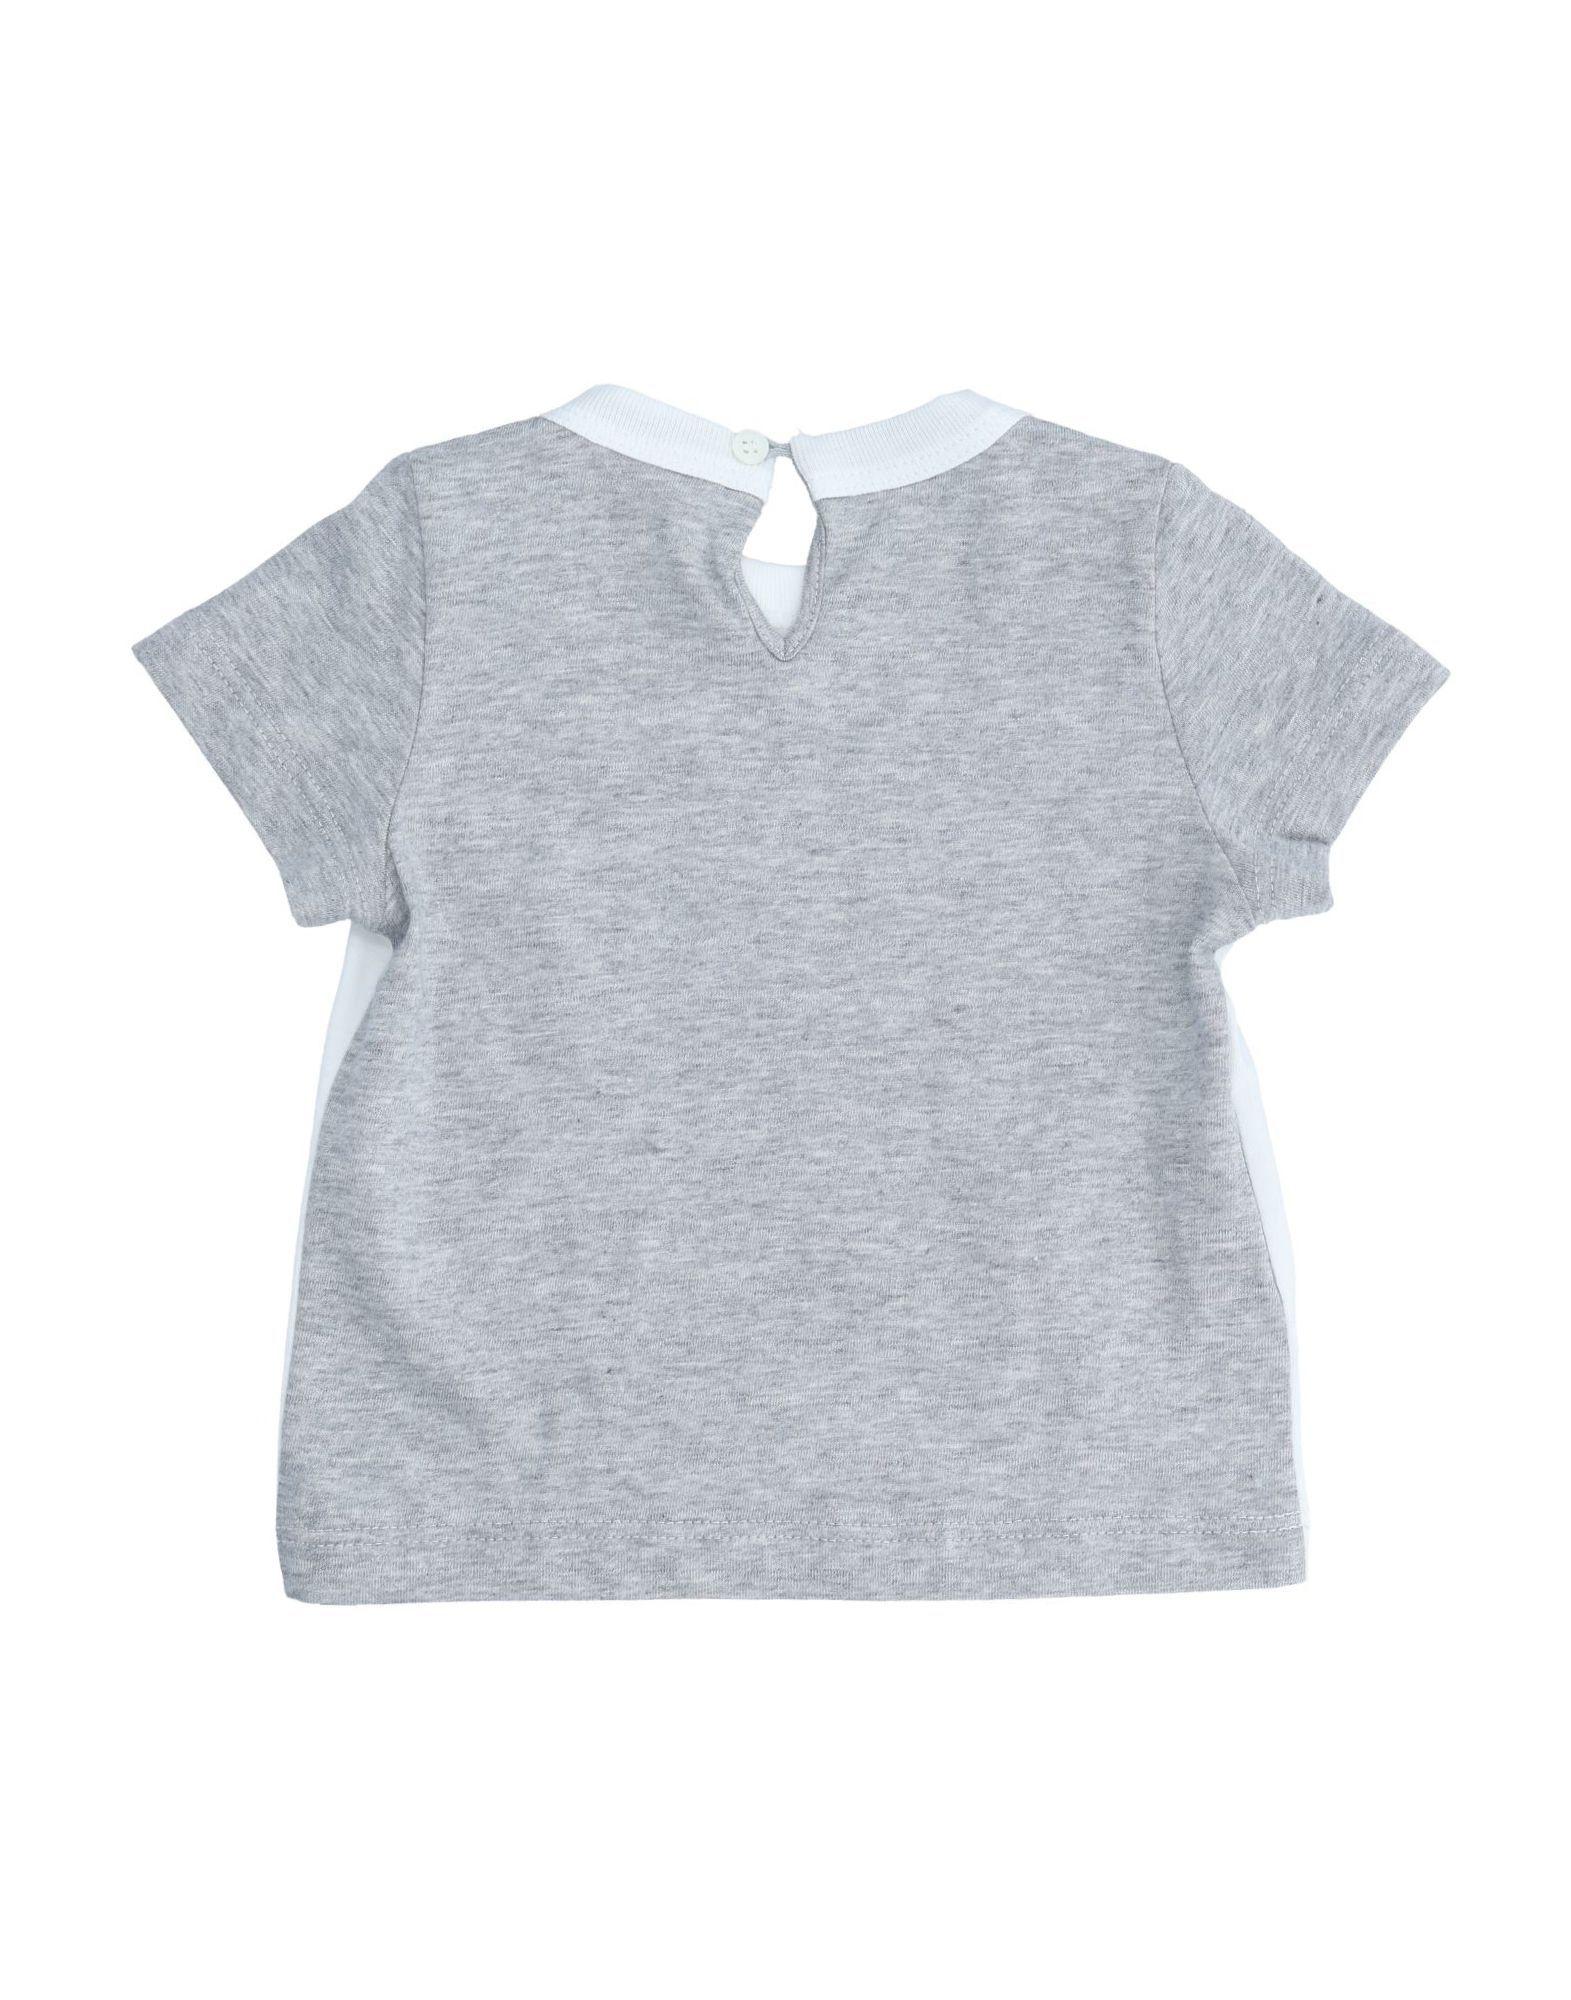 TOPWEAR Girl Marni White Cotton